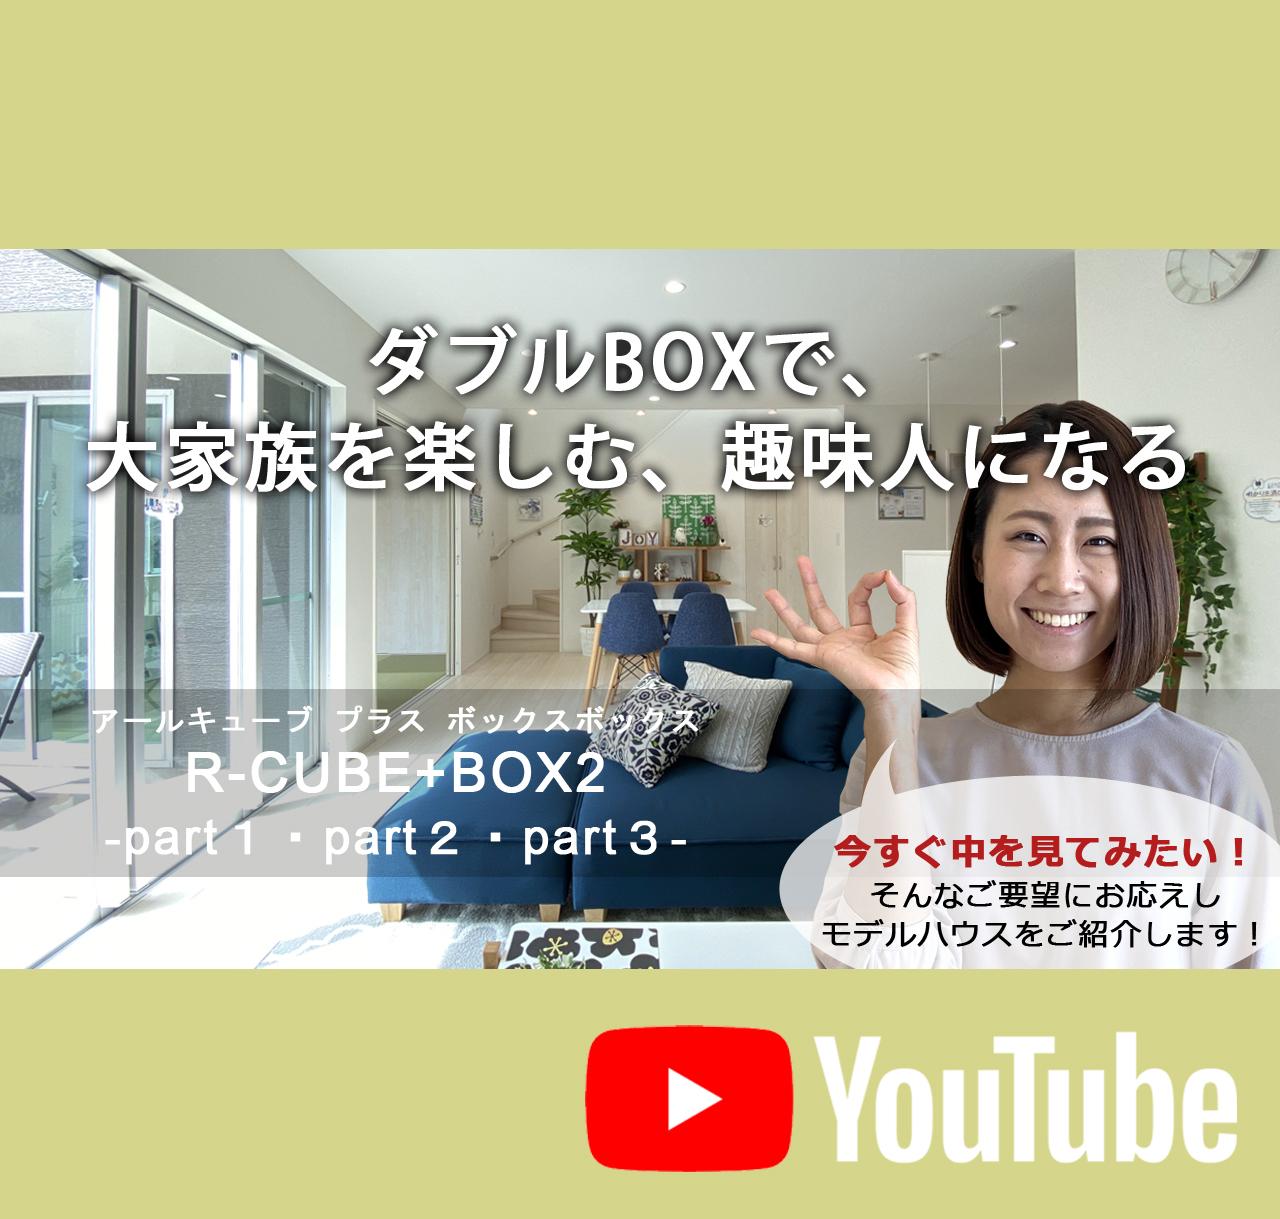 Youtube限定!WEB見学会 R-CUBE+BOX2<!--高平2-->